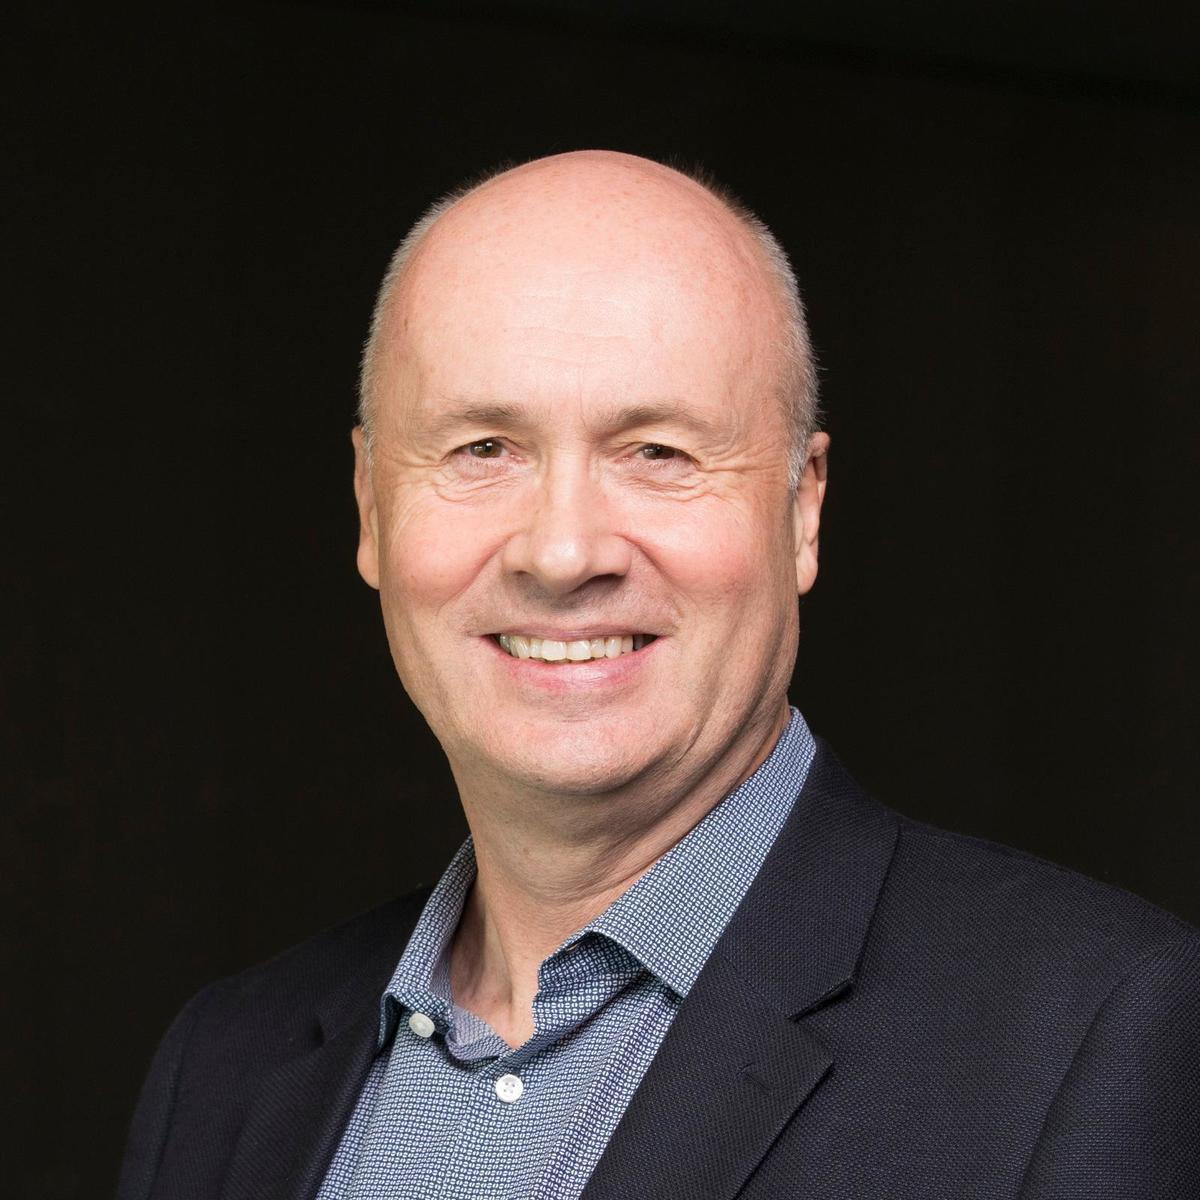 Craig Walker, VP and global CIO, Shell Downstream